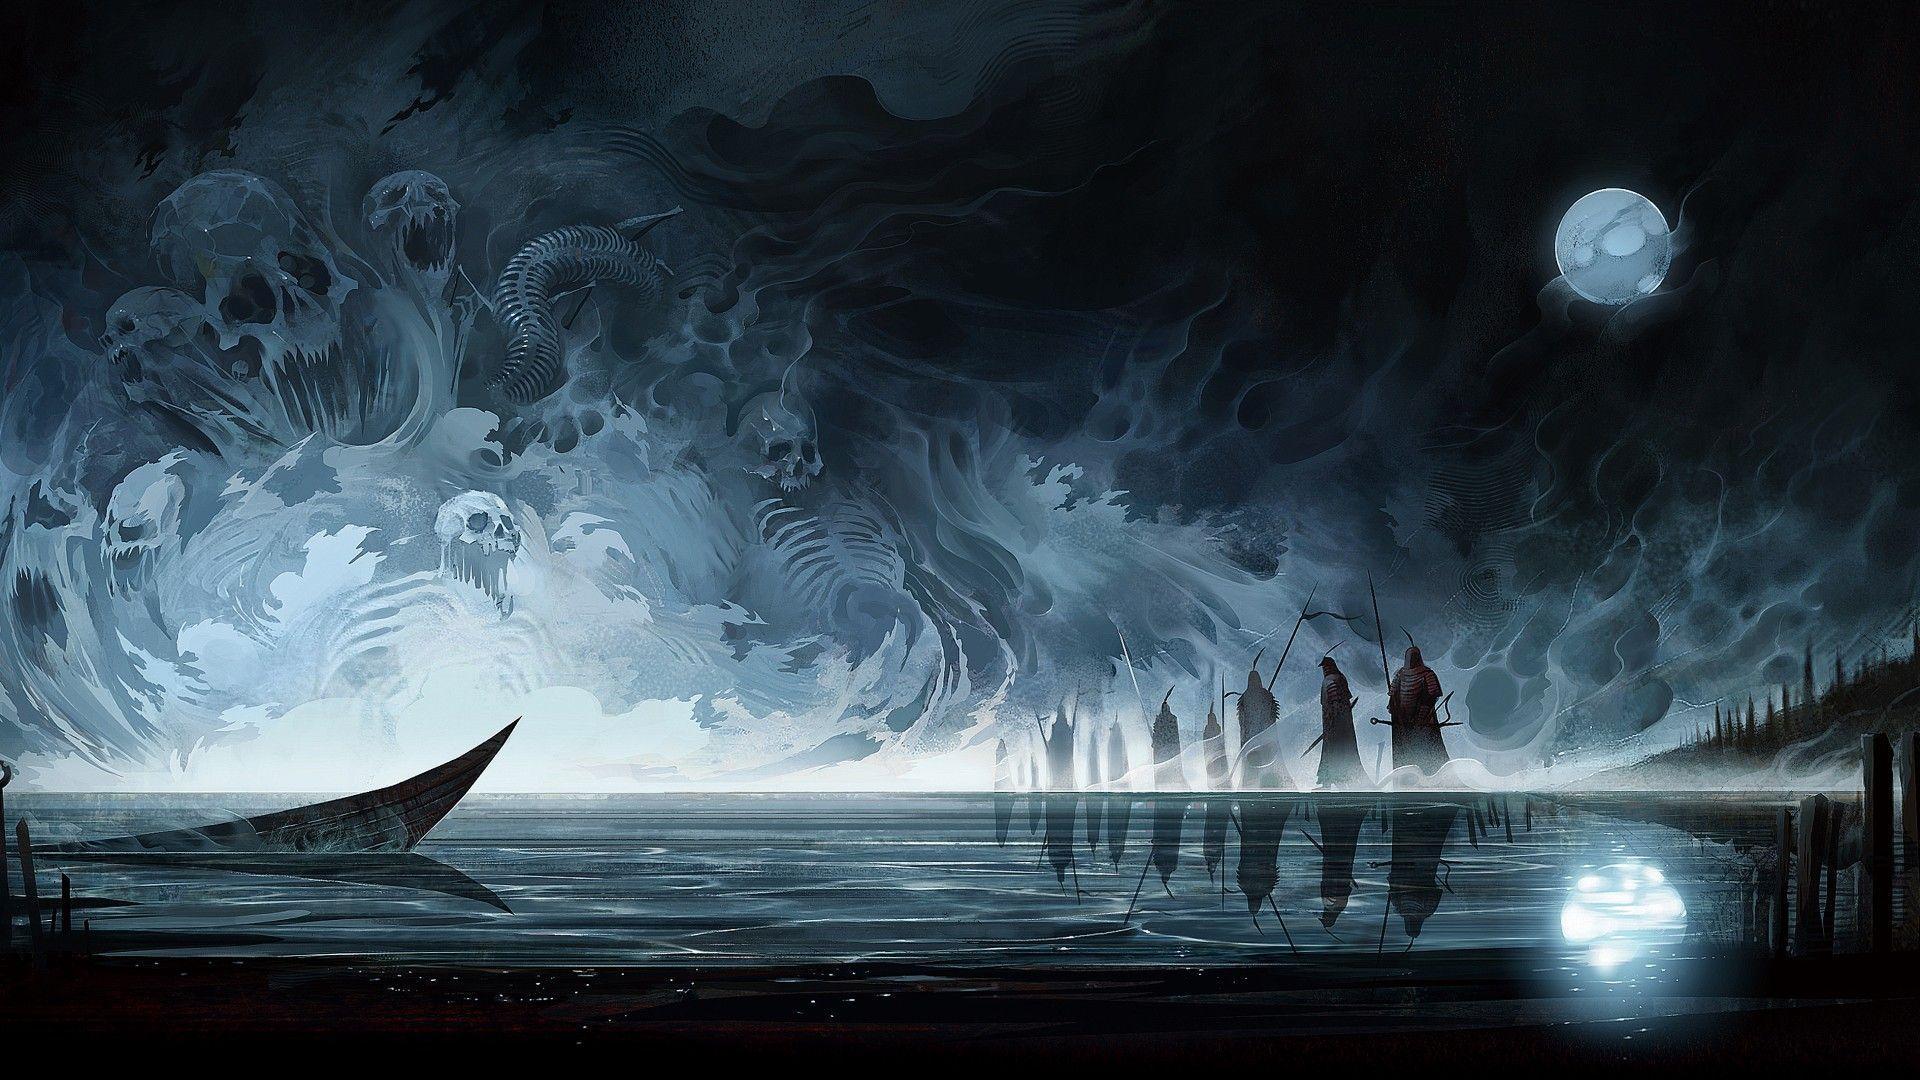 Dark Fantasy Wallpaper Posted By Michelle Johnson